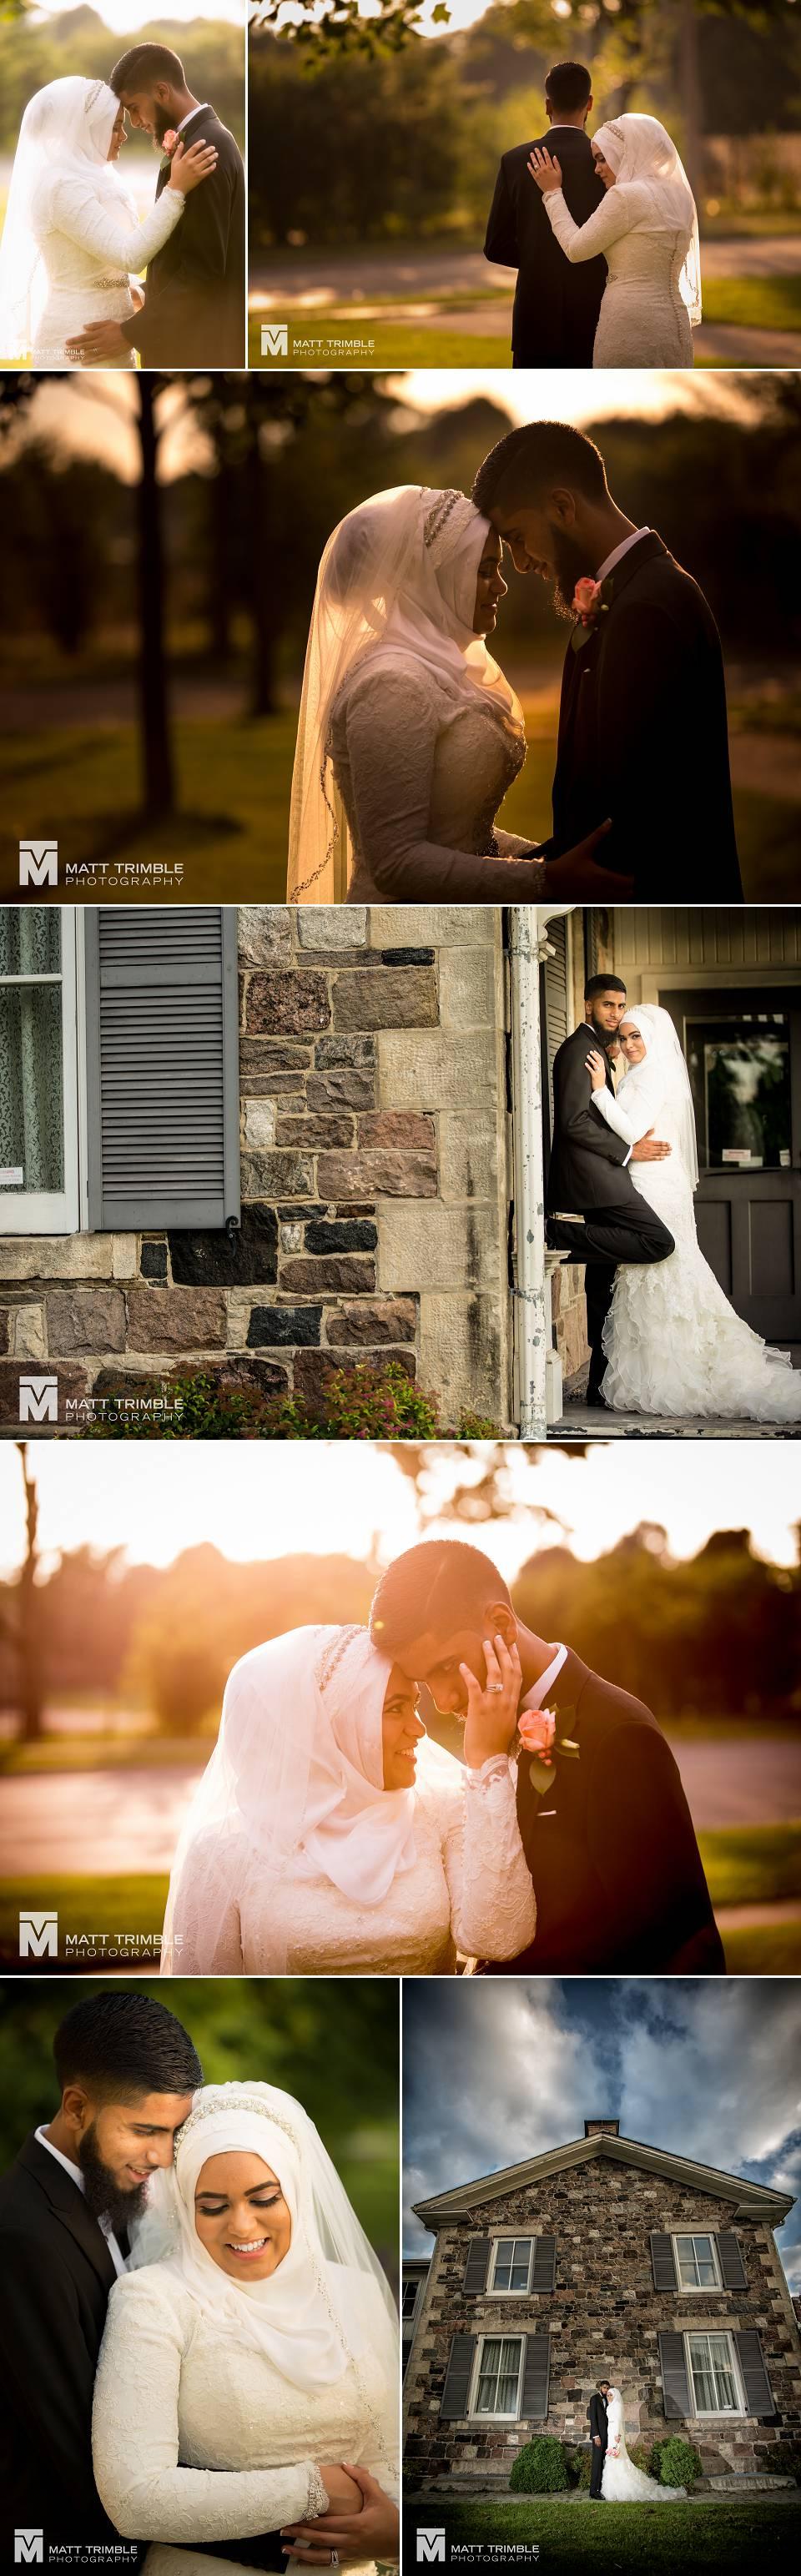 Bride and Groom toronto wedding photography